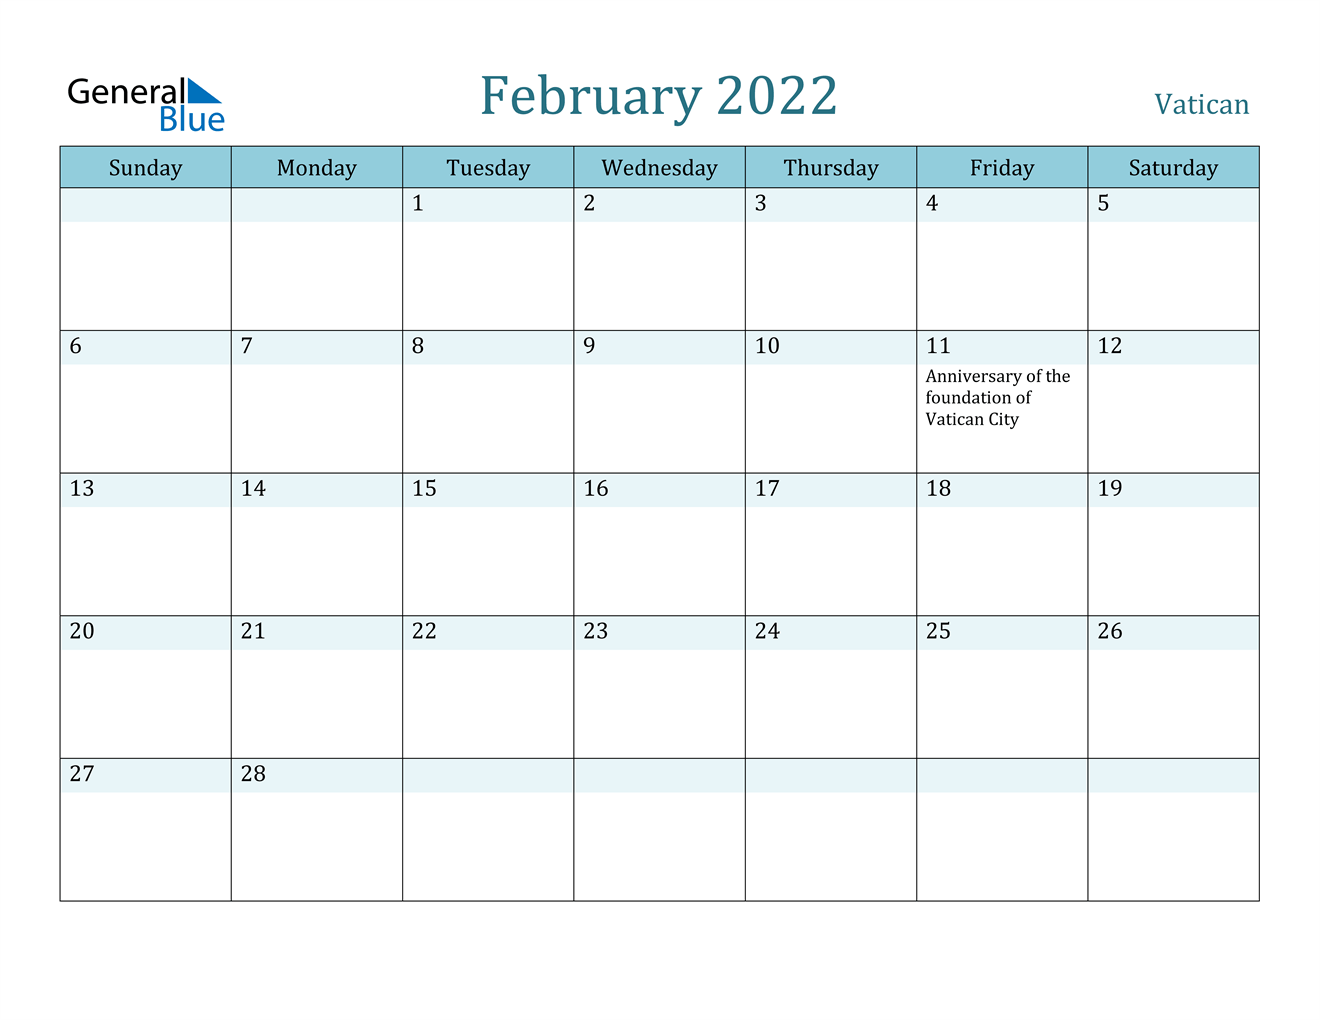 February 2022 Calendar - Vatican